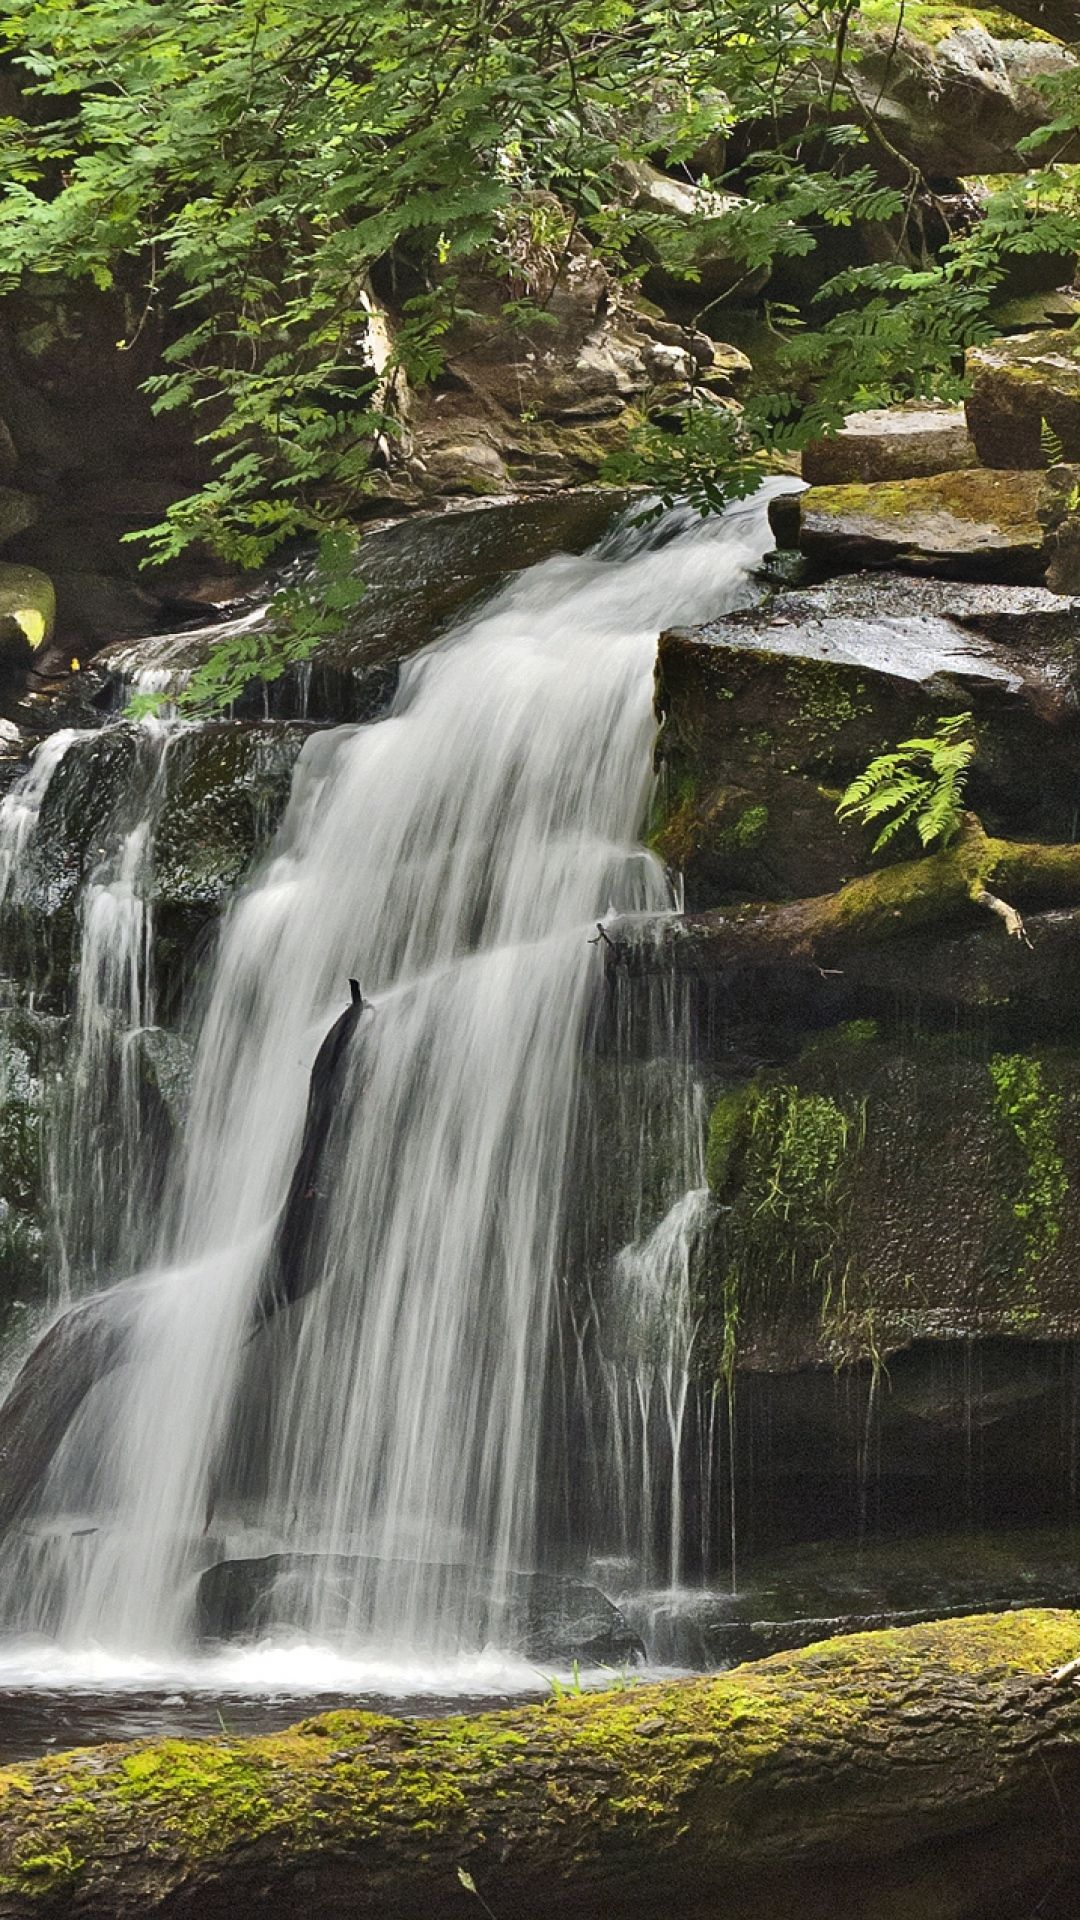 Simple Wallpaper Mobile Waterfall - b0353bab0259c5b57886a39694d703e6  Snapshot_42398.jpg